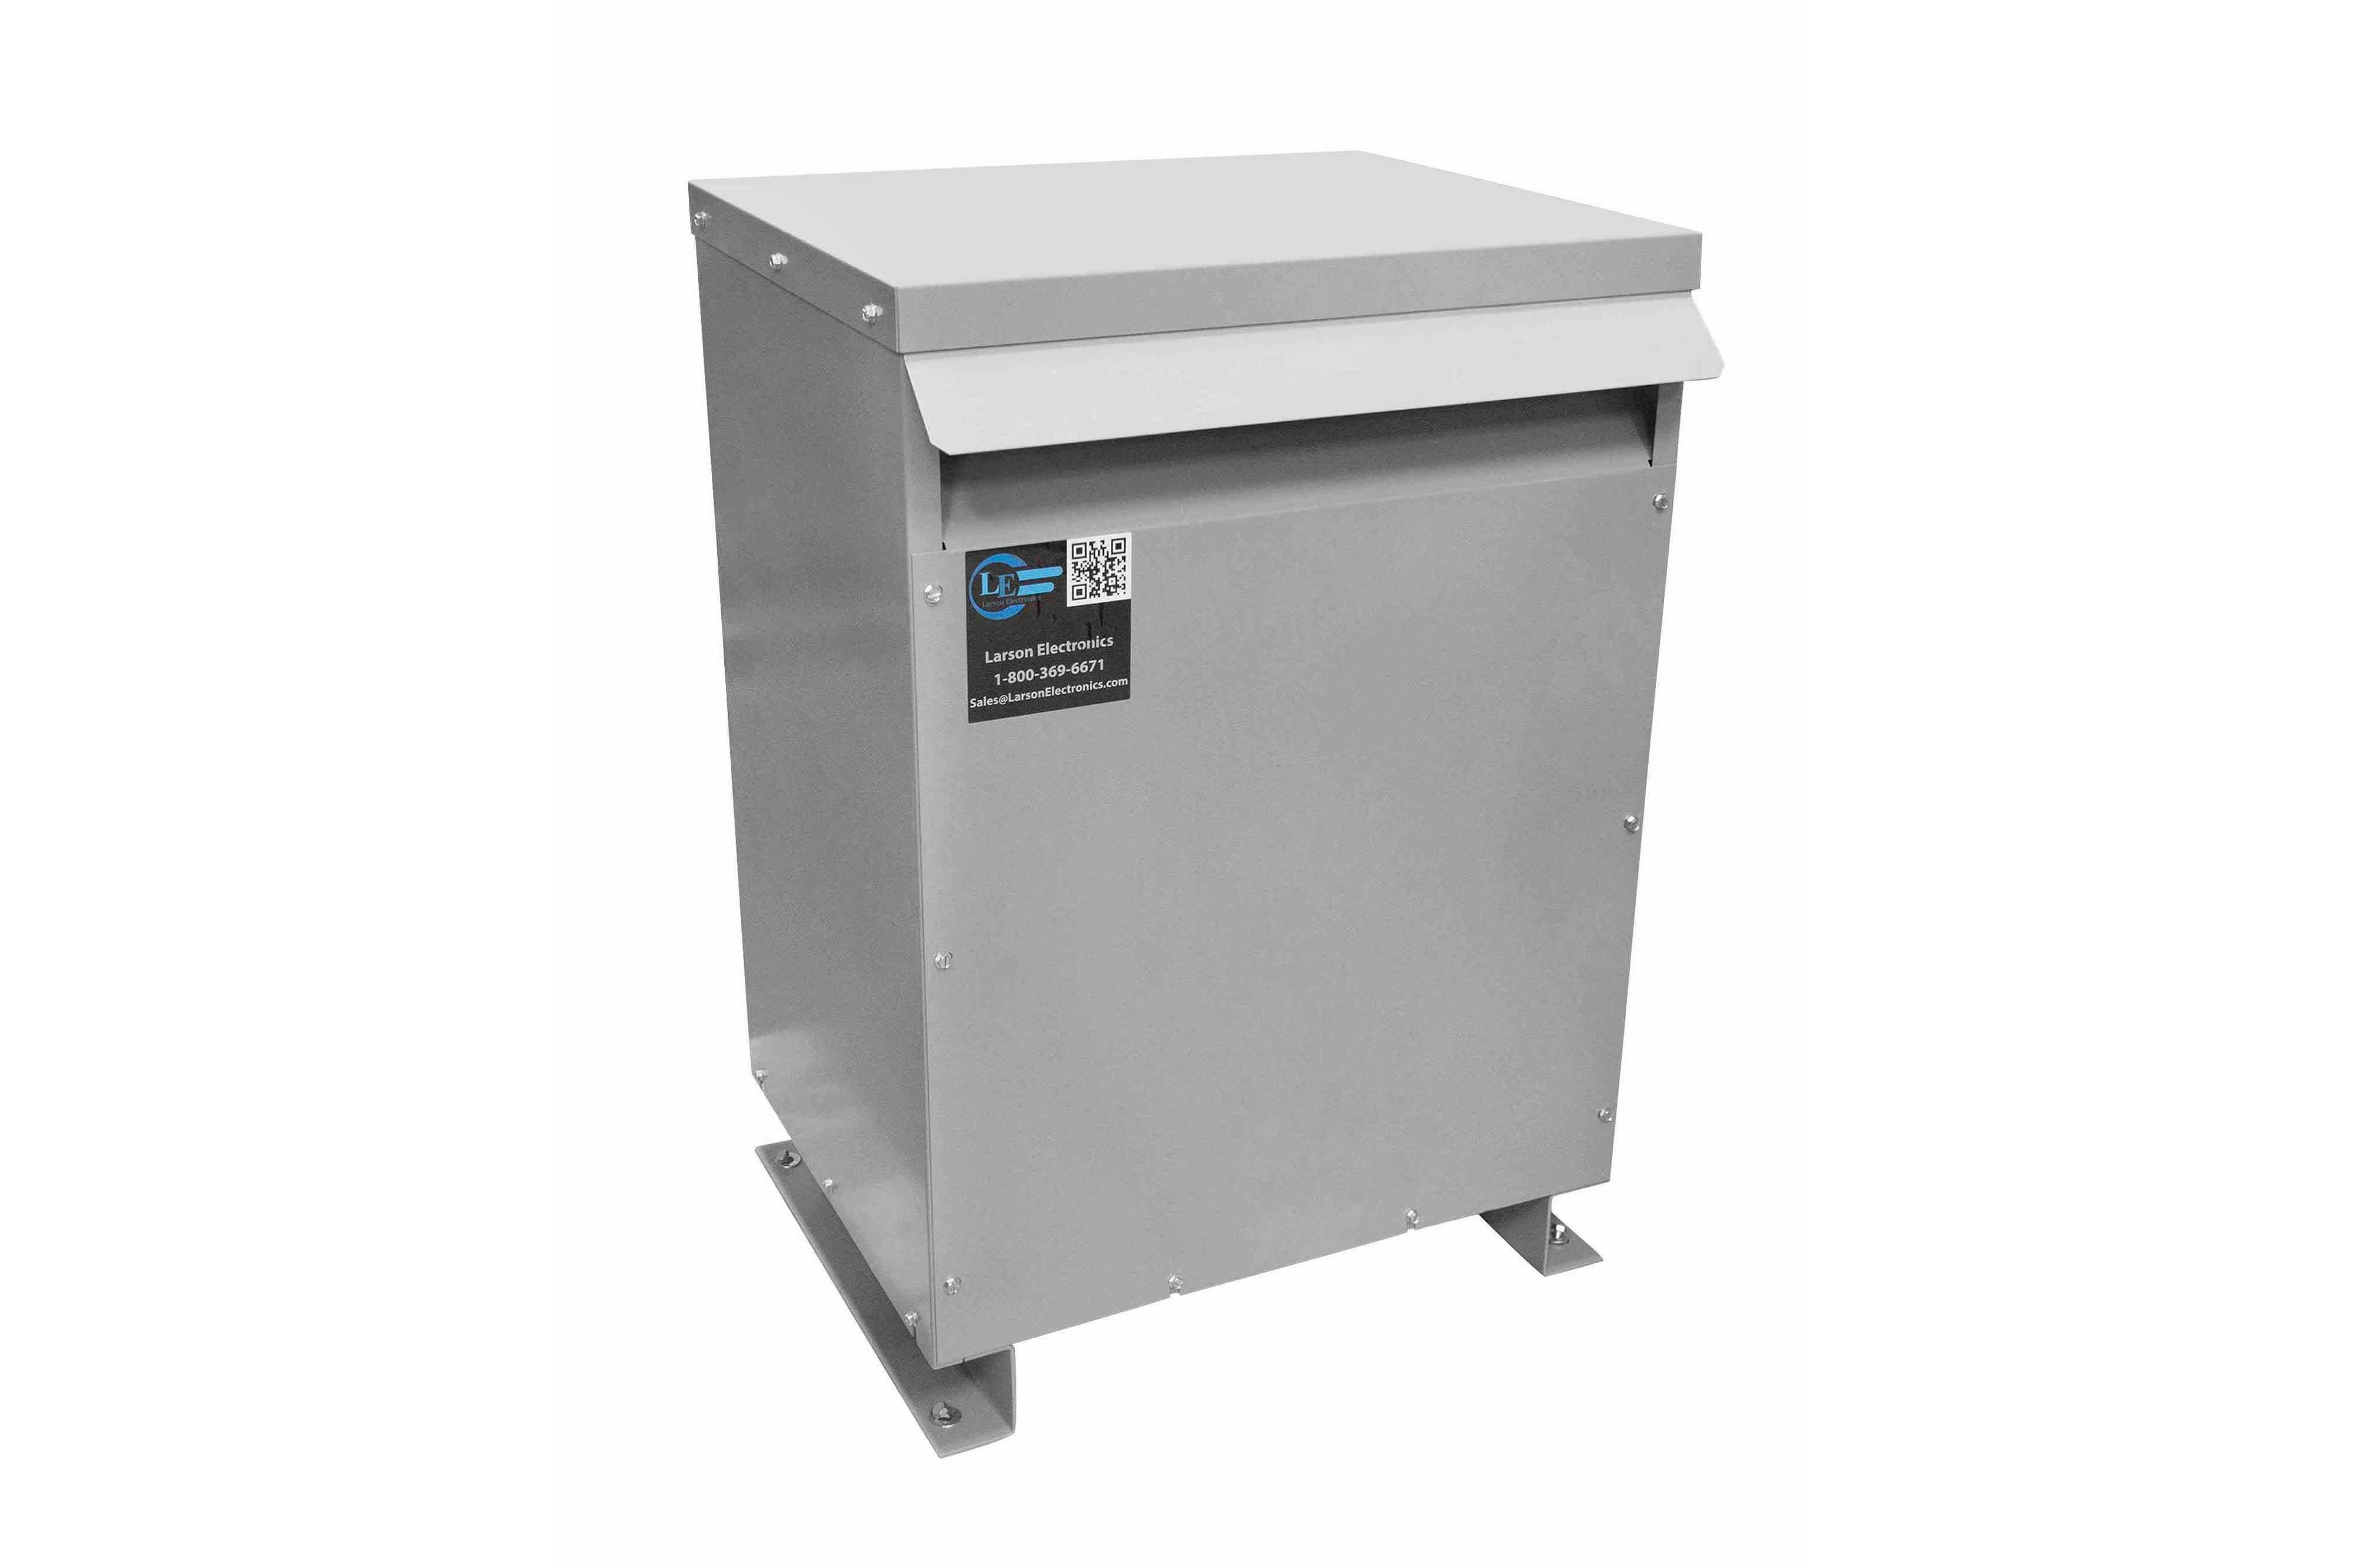 52.5 kVA 3PH Isolation Transformer, 460V Wye Primary, 400V Delta Secondary, N3R, Ventilated, 60 Hz